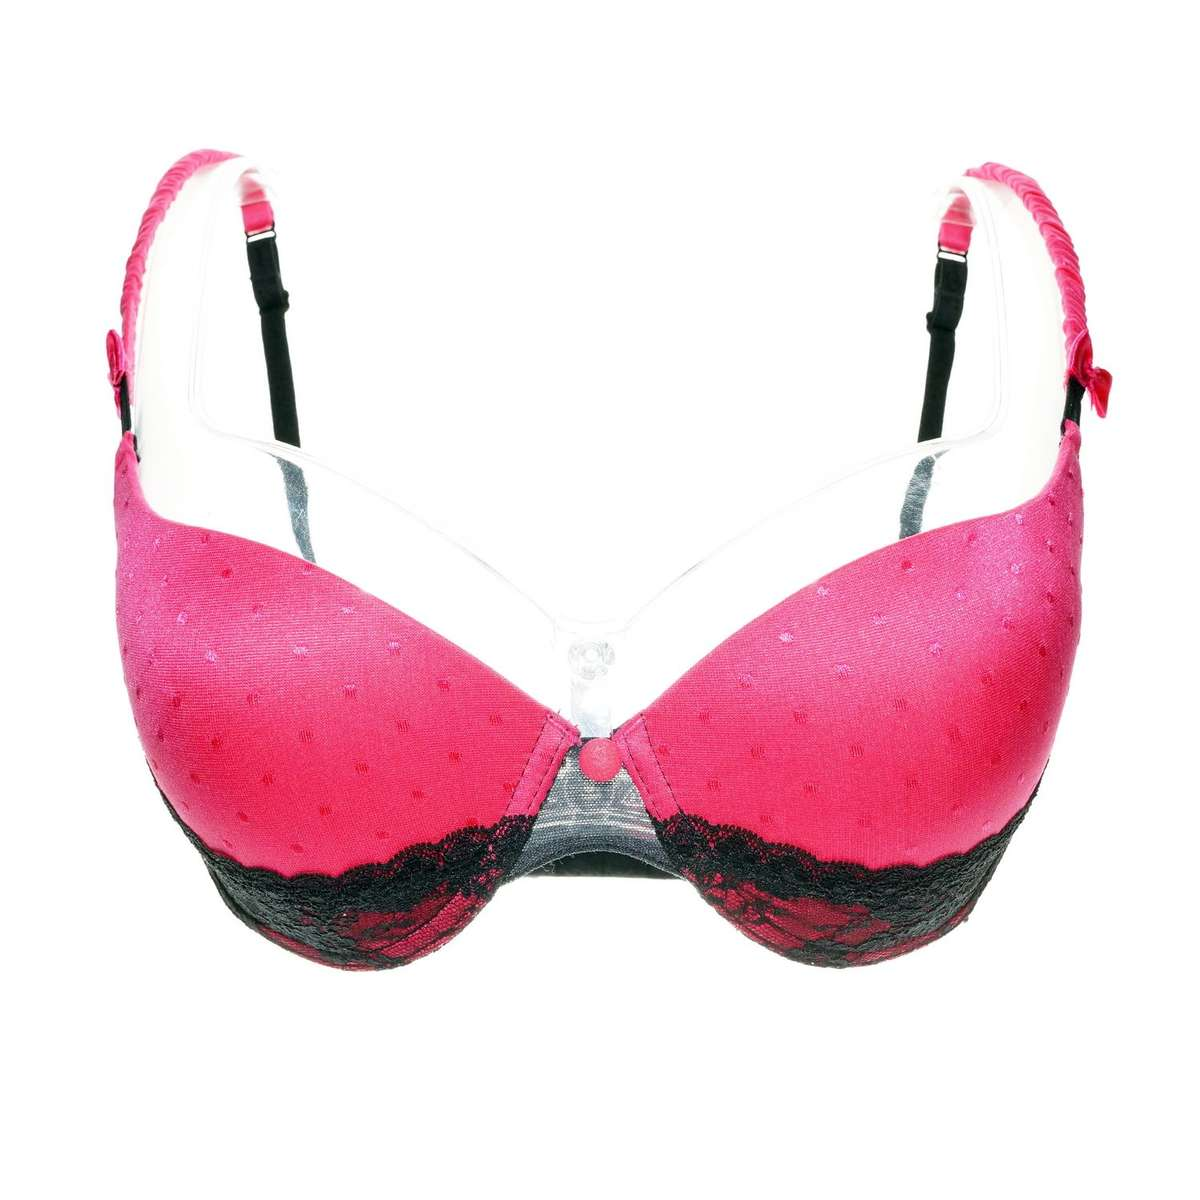 VIP Pink Padded 1/2 Bra